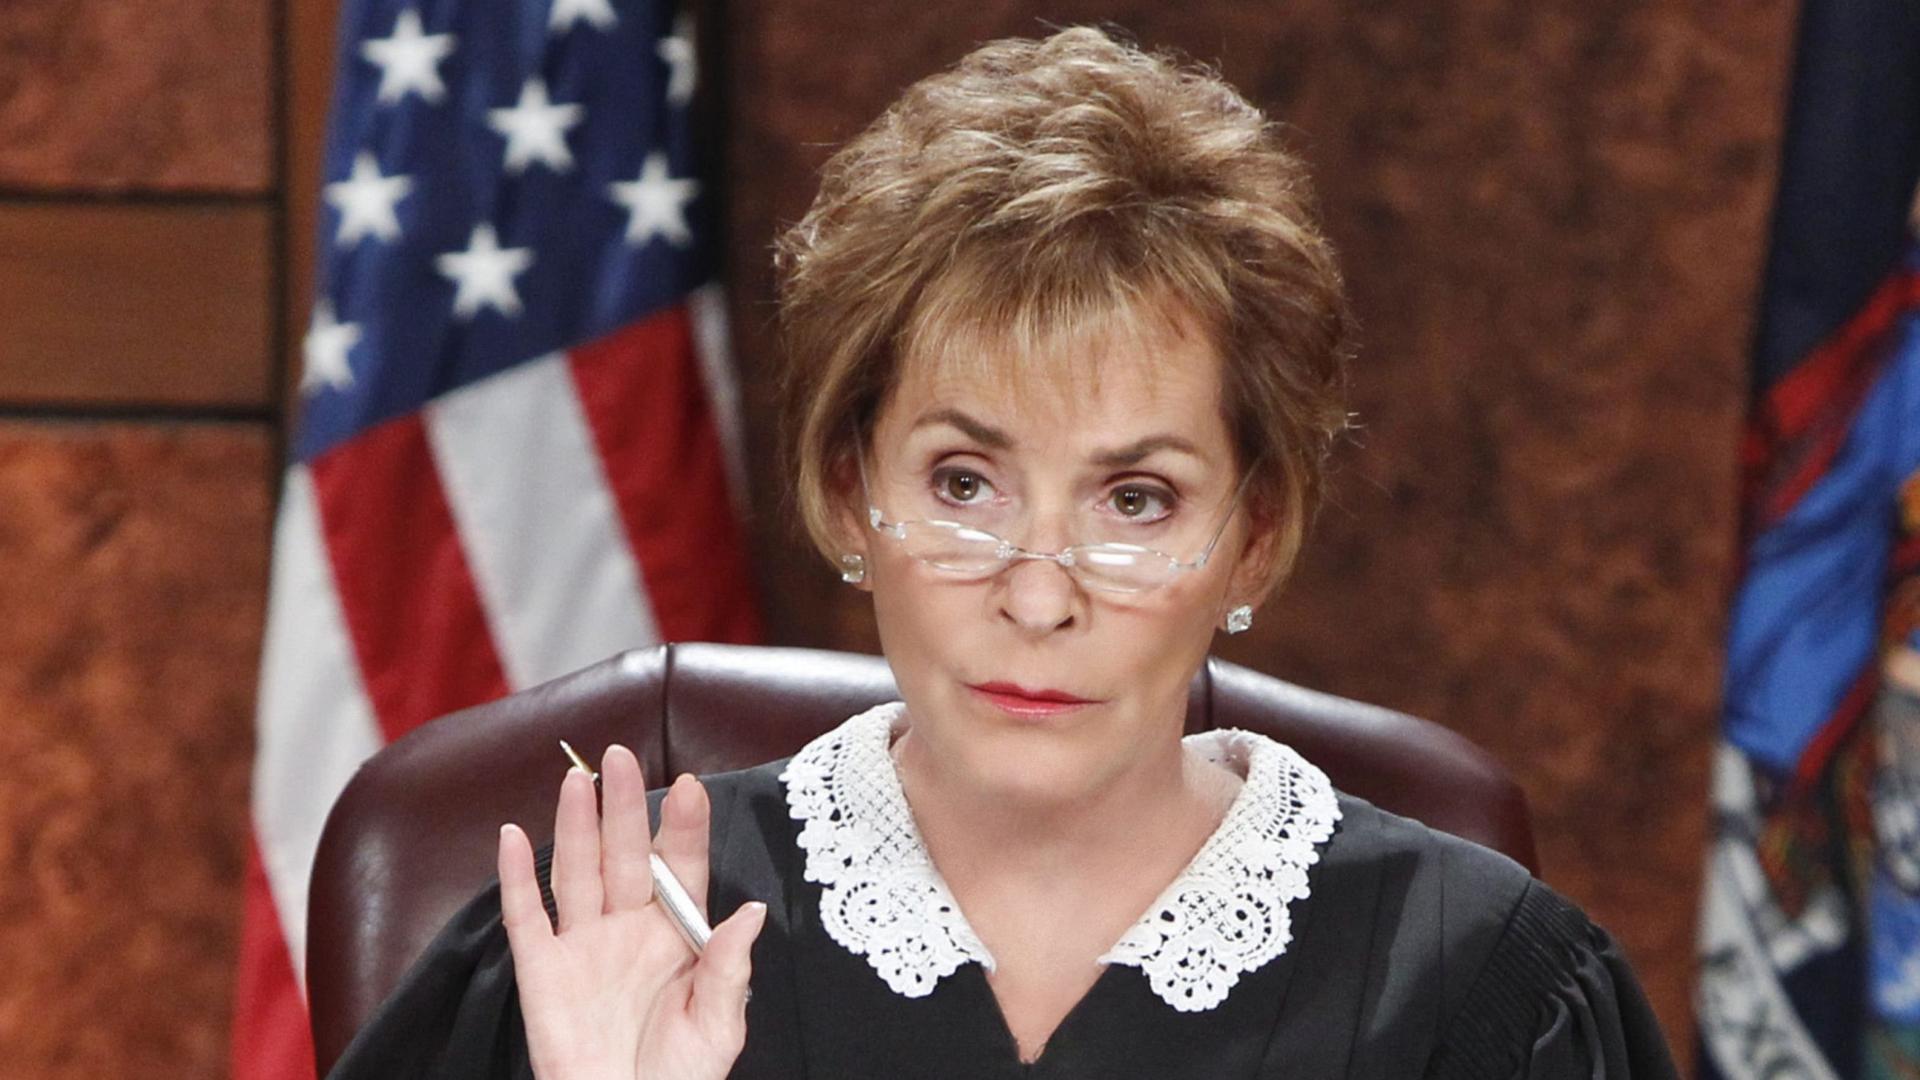 7. THE JUDGE JUDY PRINCIPLE -